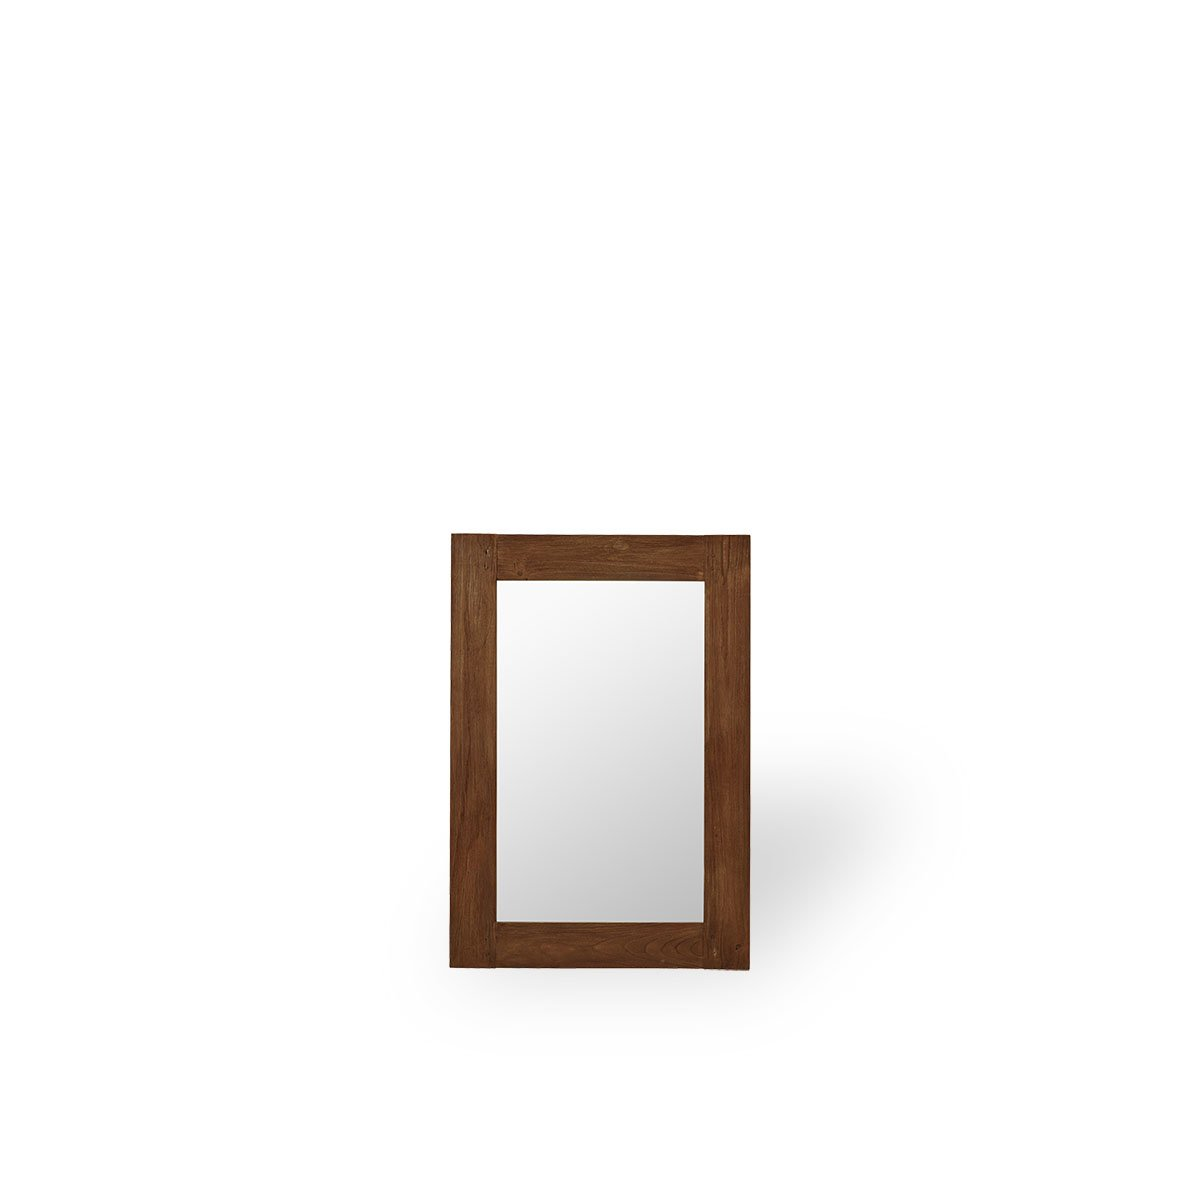 Sika Design Spiegel Lucas 100x70 cm Teak